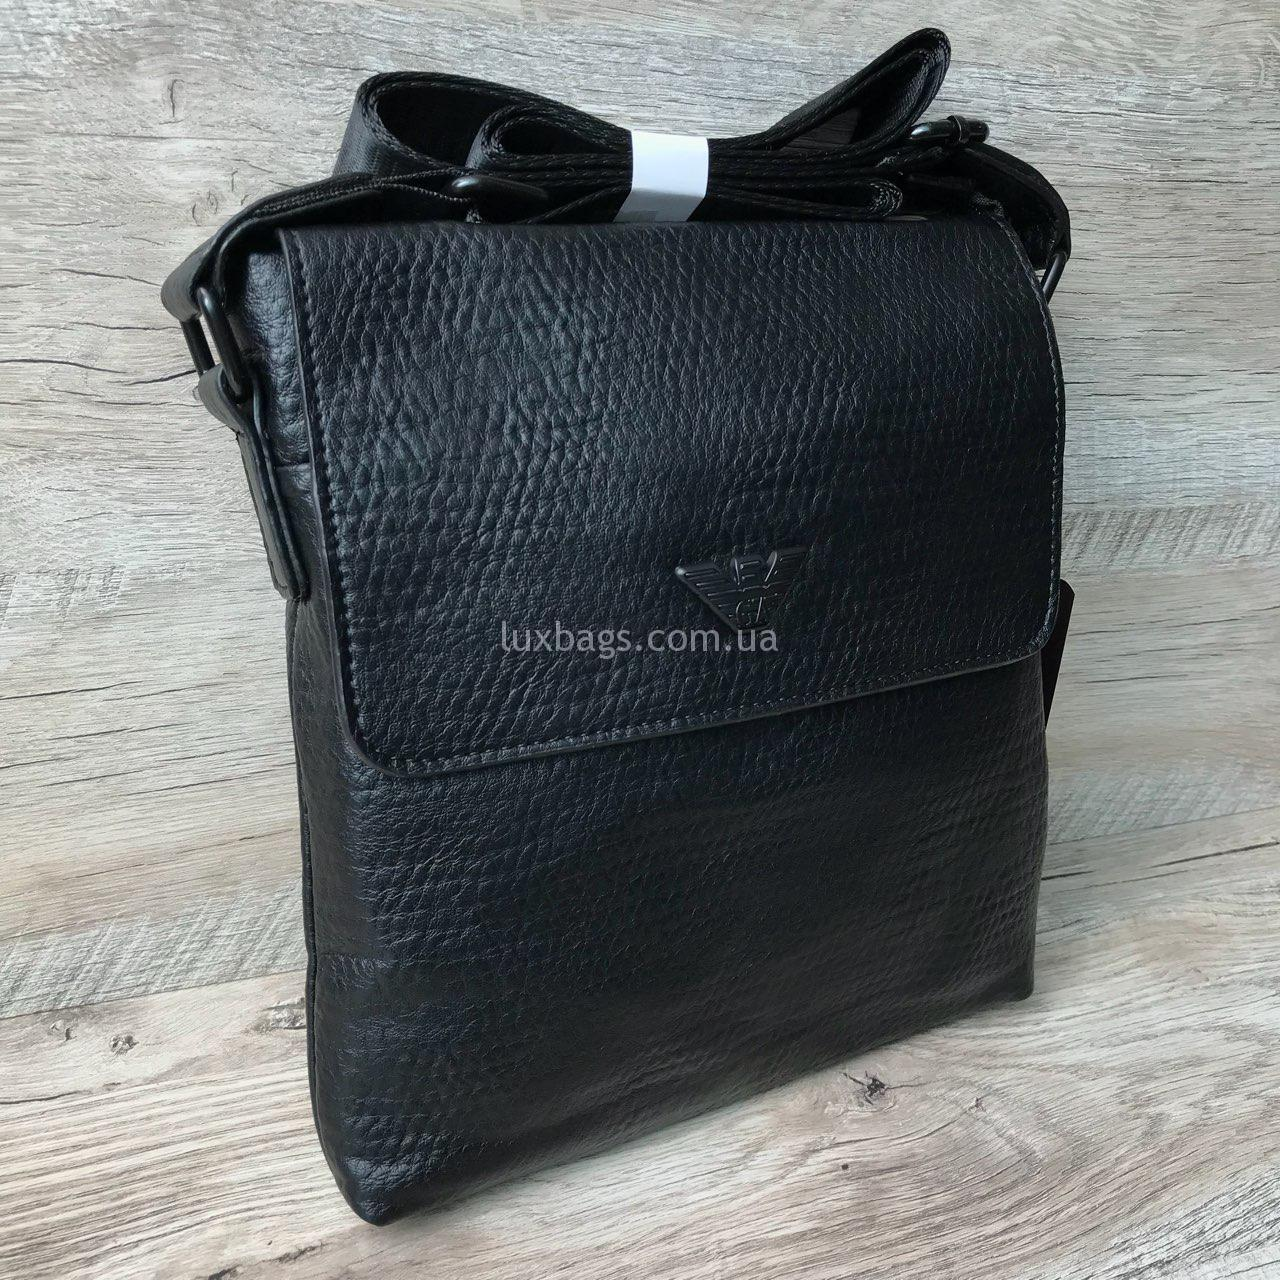 7502519d8769 Мужская сумка Armani через плечо с клапаном | lux-bags